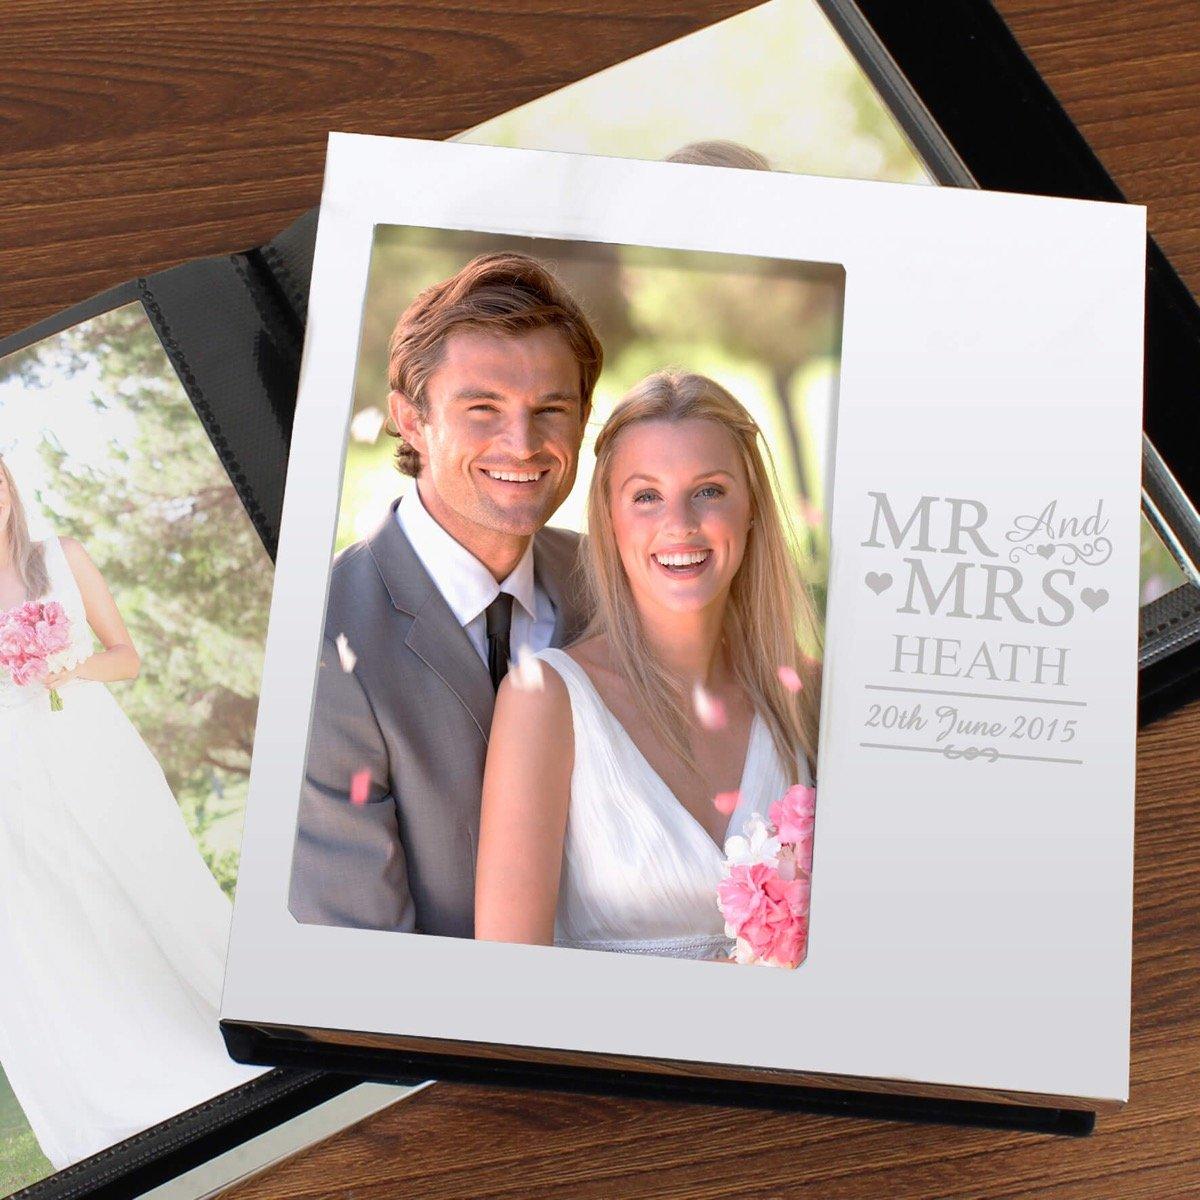 Personalised Mr & Mrs Photo Frame Album 6×4